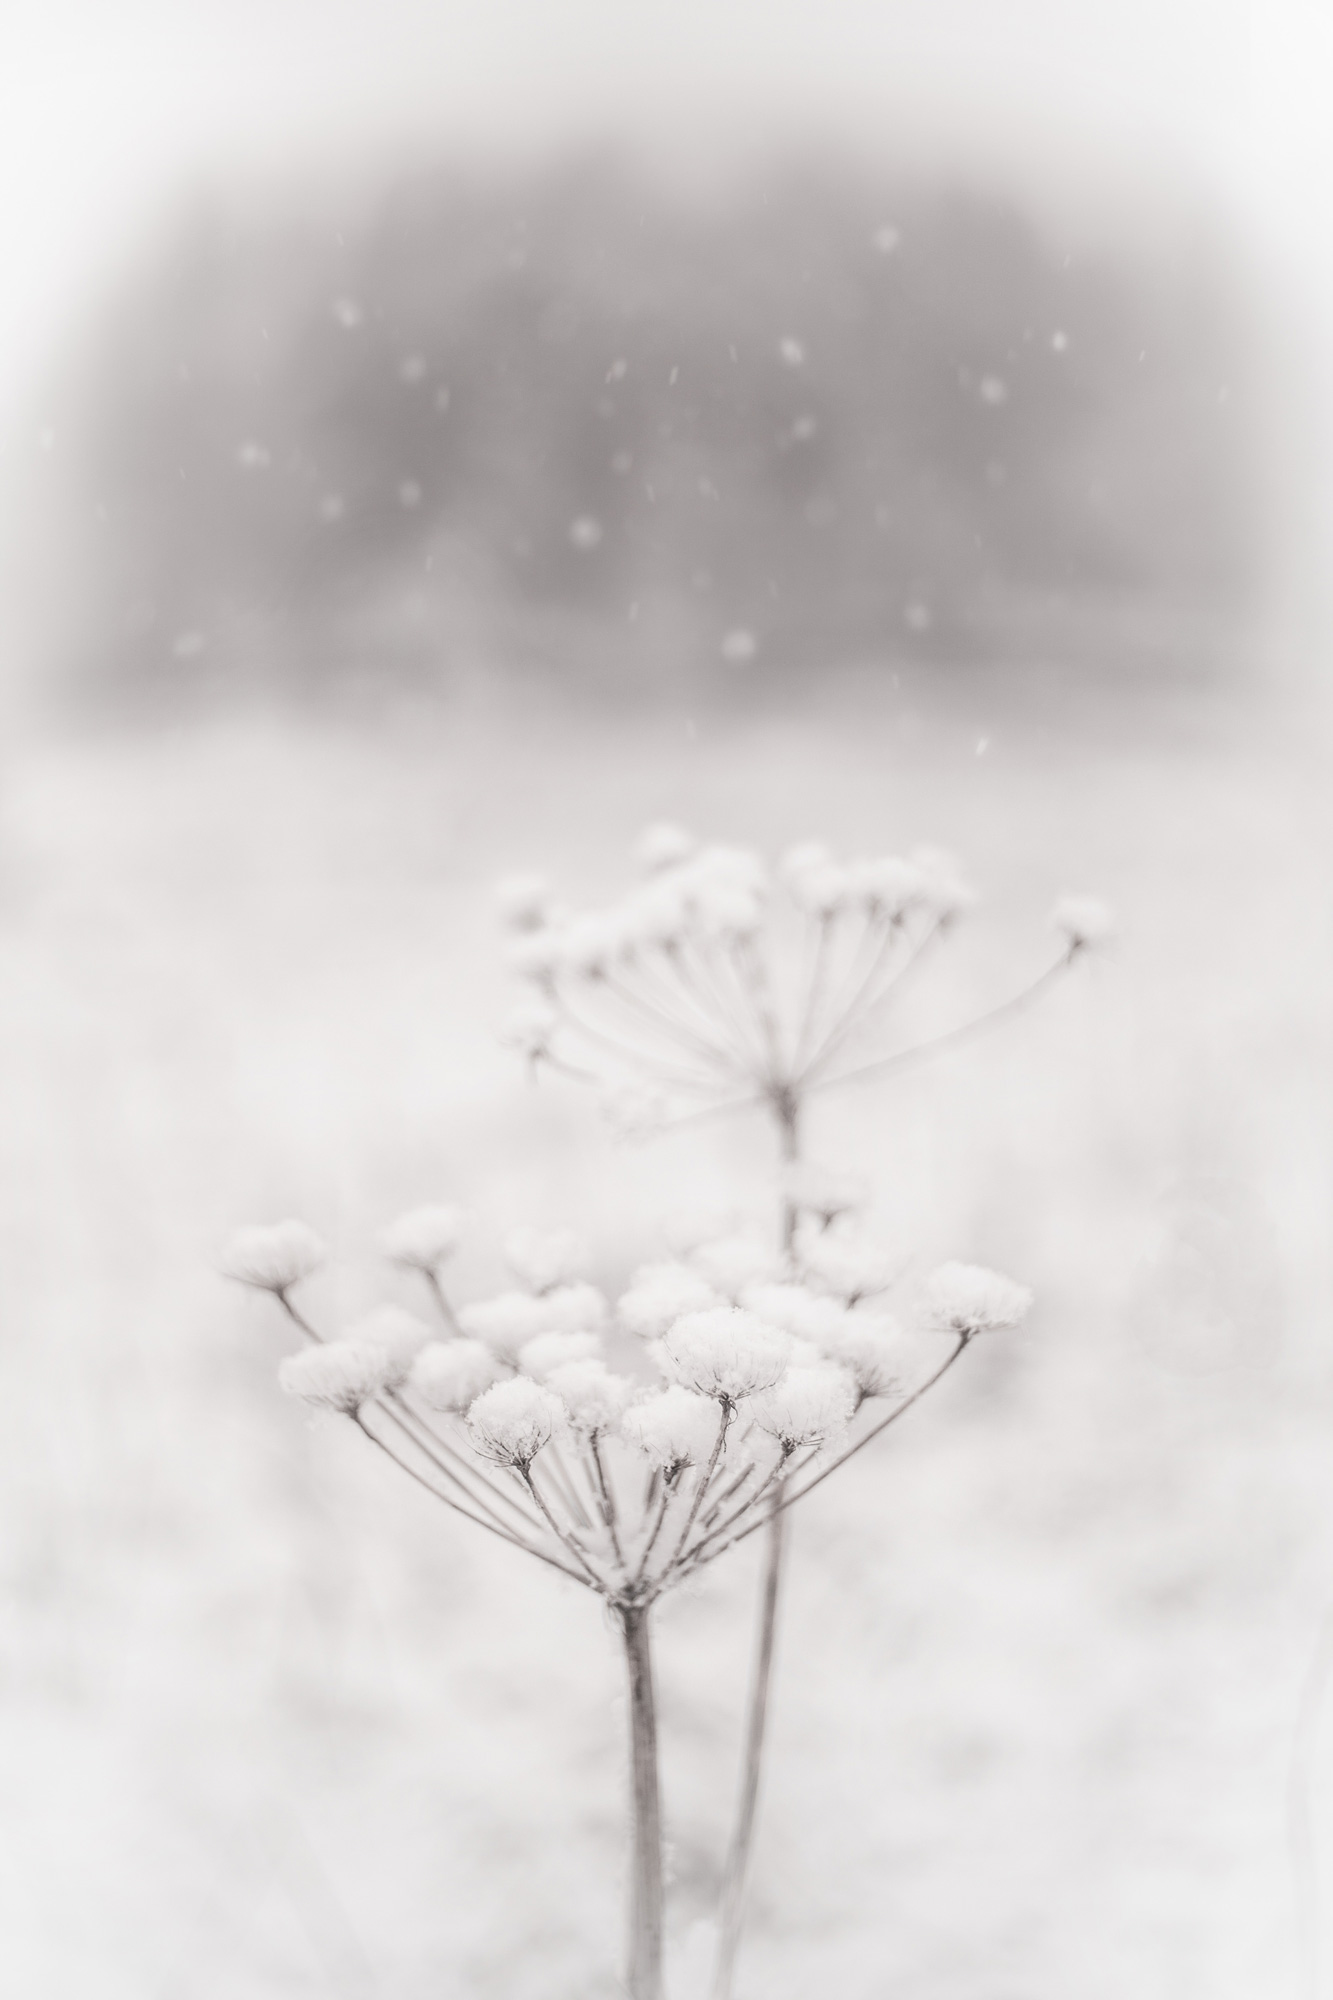 Leonard_snow_falling_on_cow_parsnipsLR.jpg